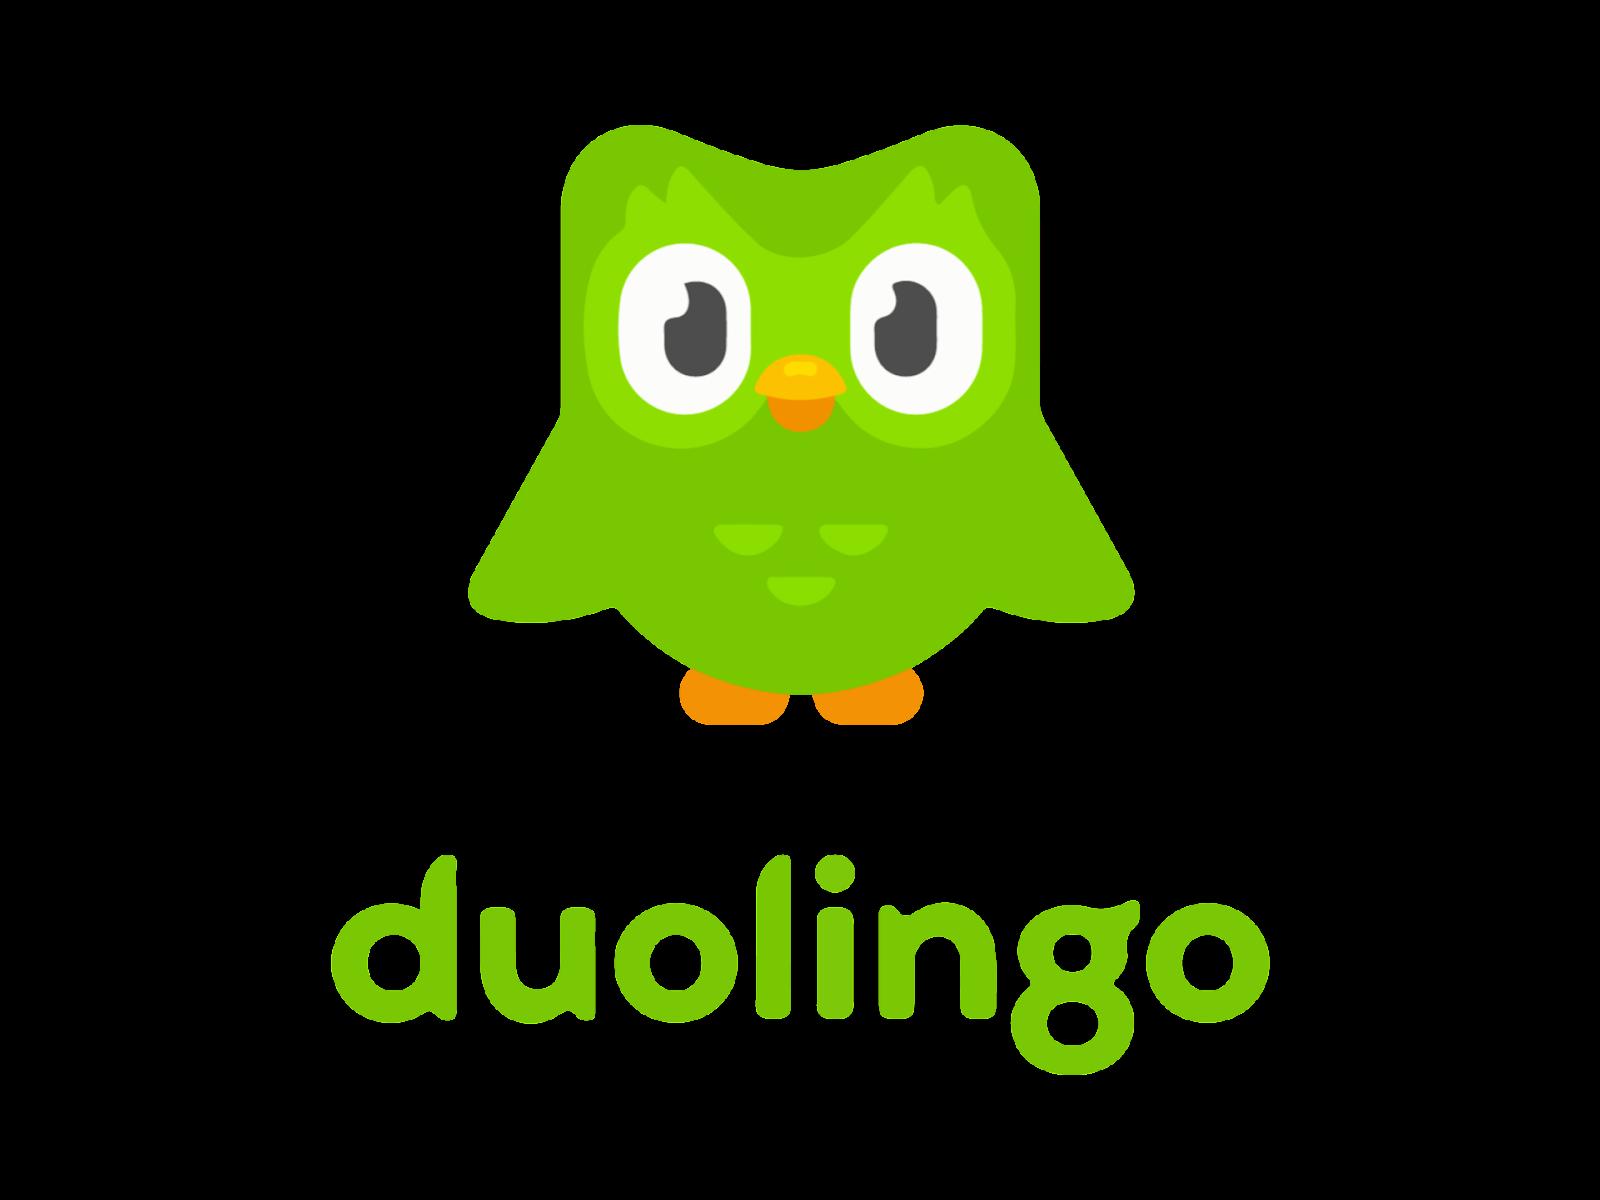 Logo Duolingo Format PNG